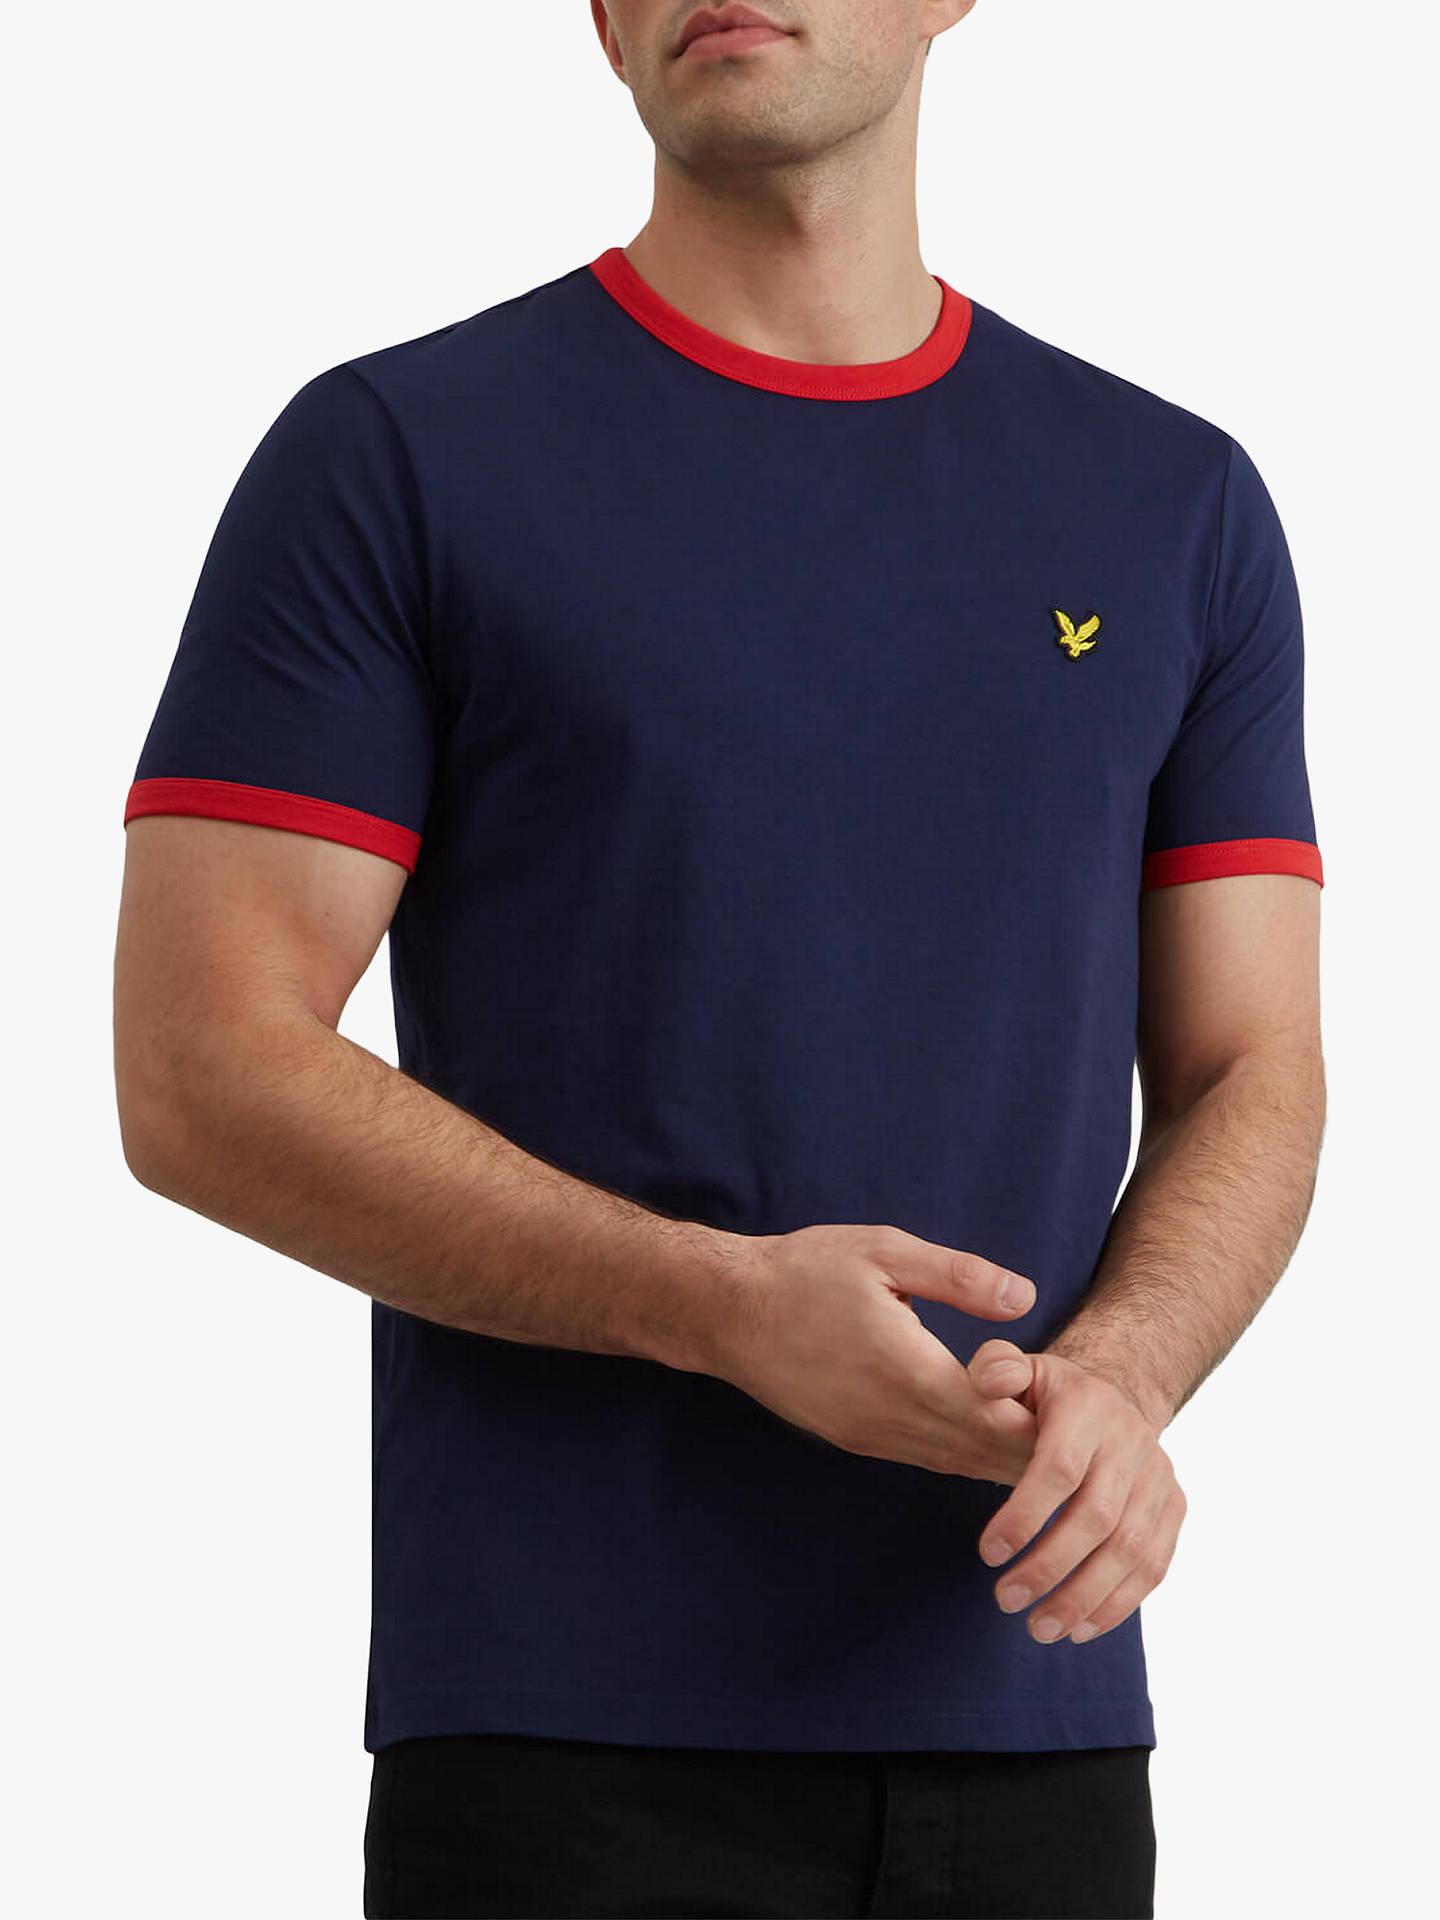 Lyle /& Scott Crew Neck Ringer T-shirt Plain Crew Neck Cotton Tee Navy Blue Top